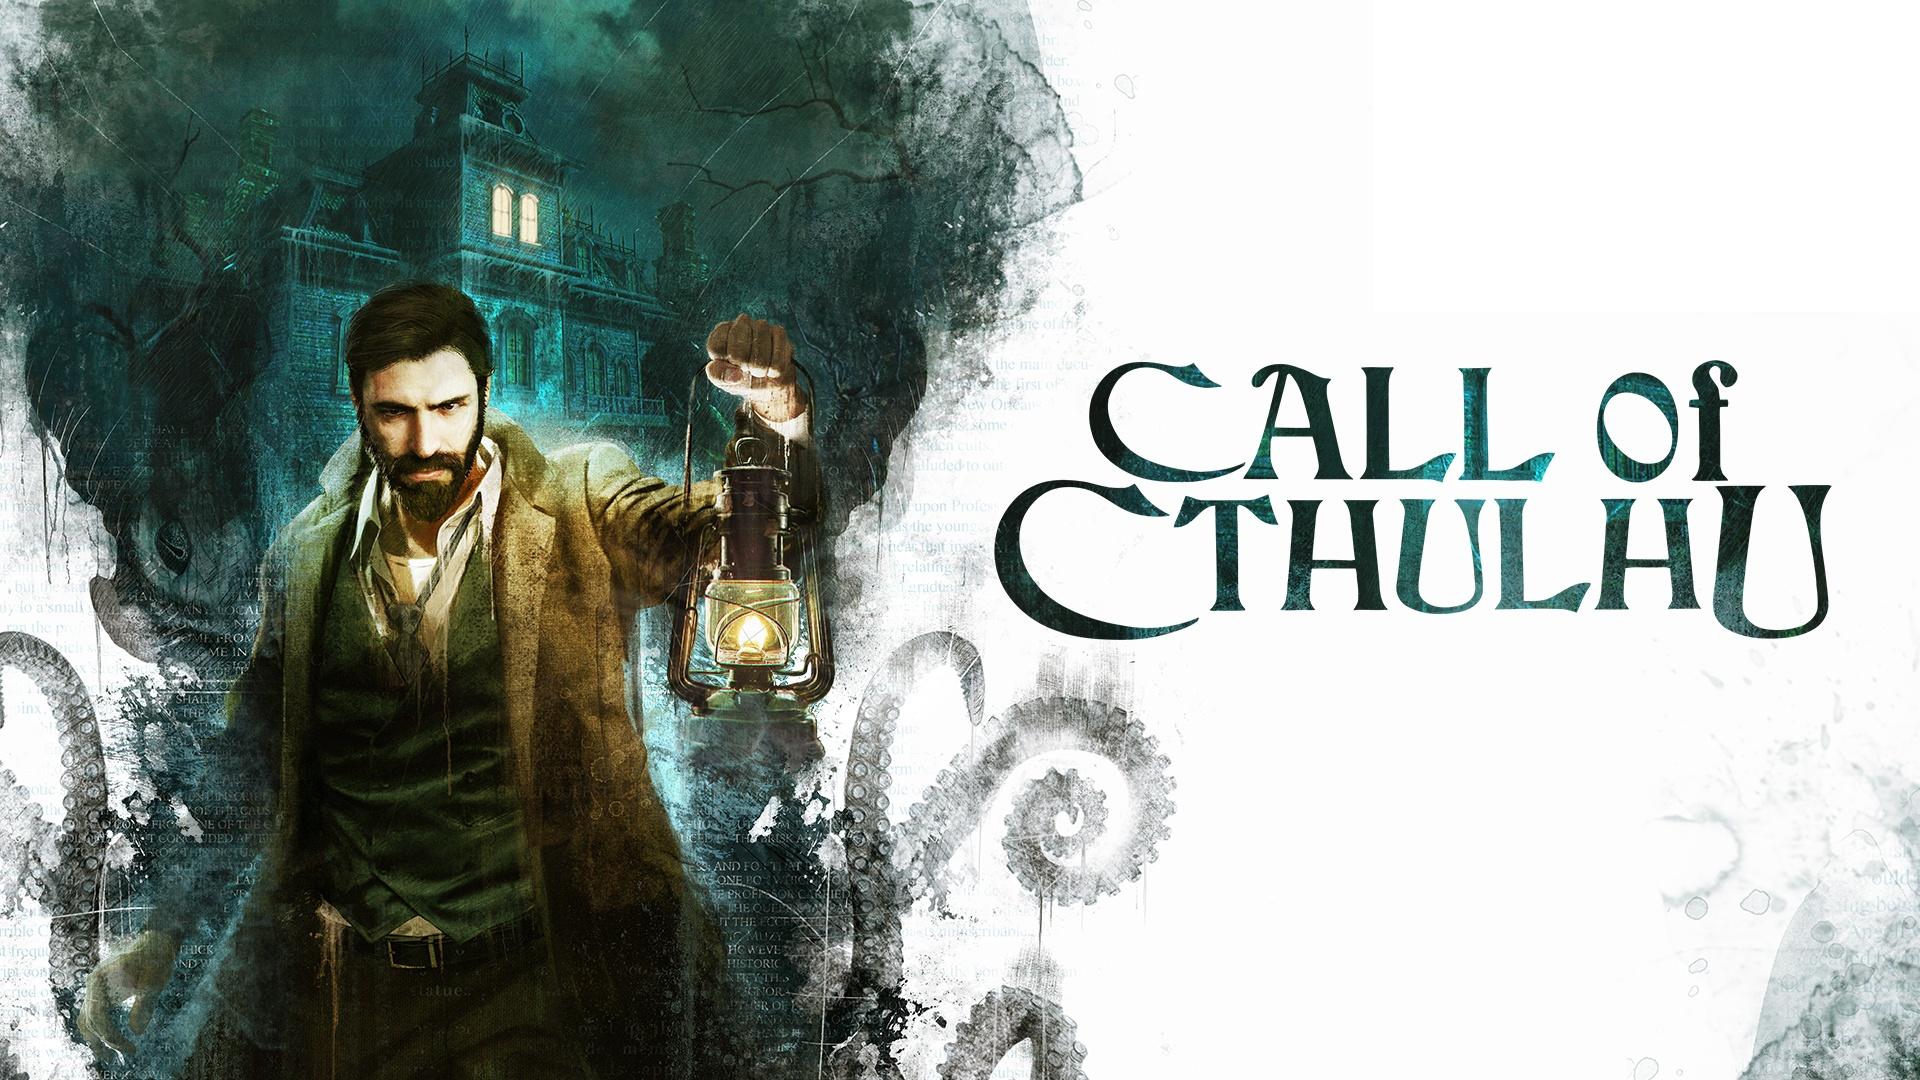 Call of Cthulhu | PC Steam Game | Fanatical